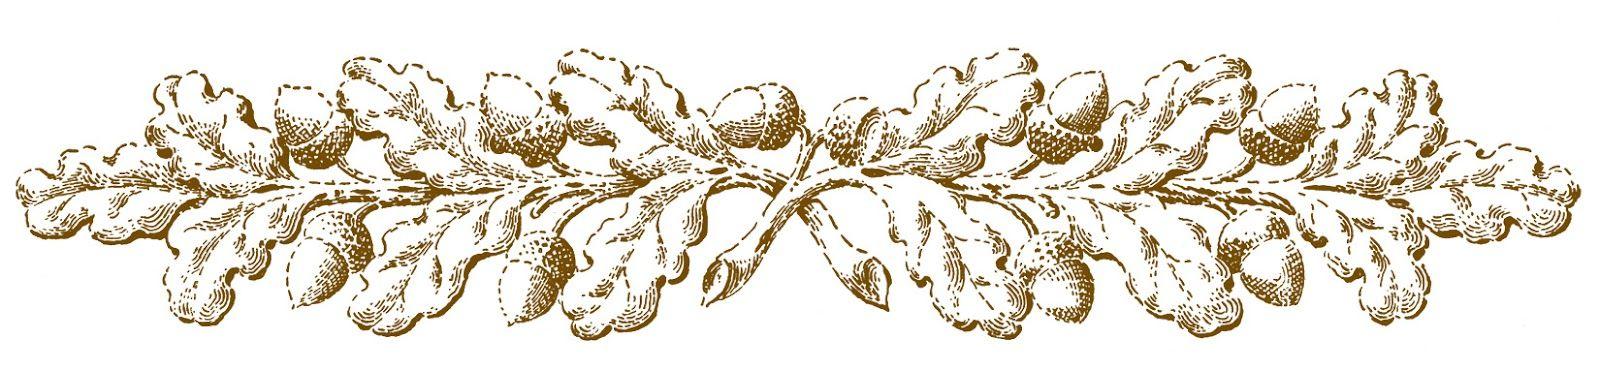 Fall clip art ornamental. Autumn clipart vintage